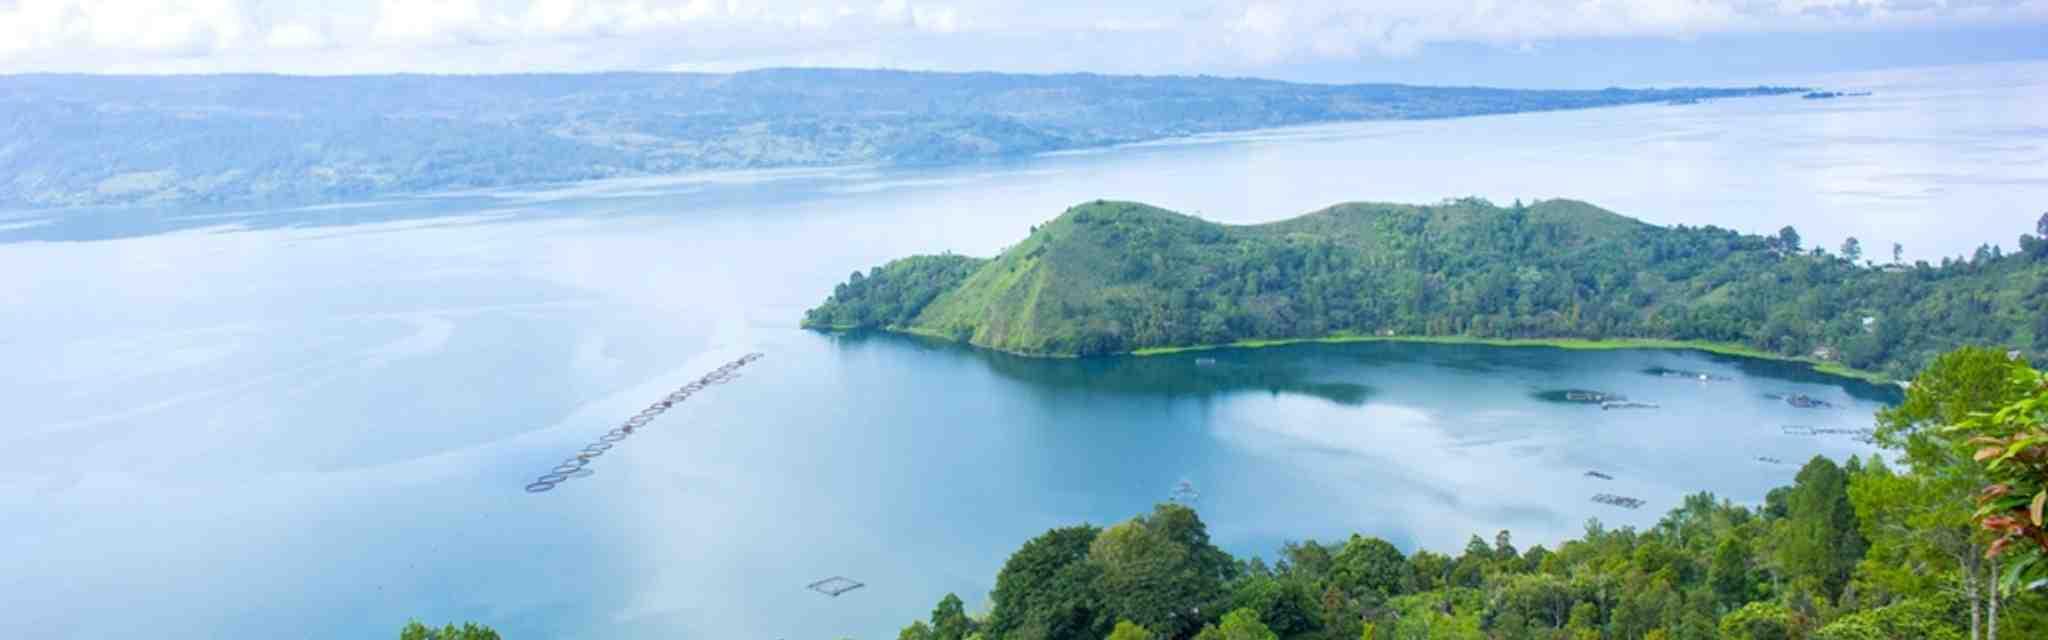 10 Tempat Wisata di Sumatera Utara Ini Wajib Kamu Kunjungi